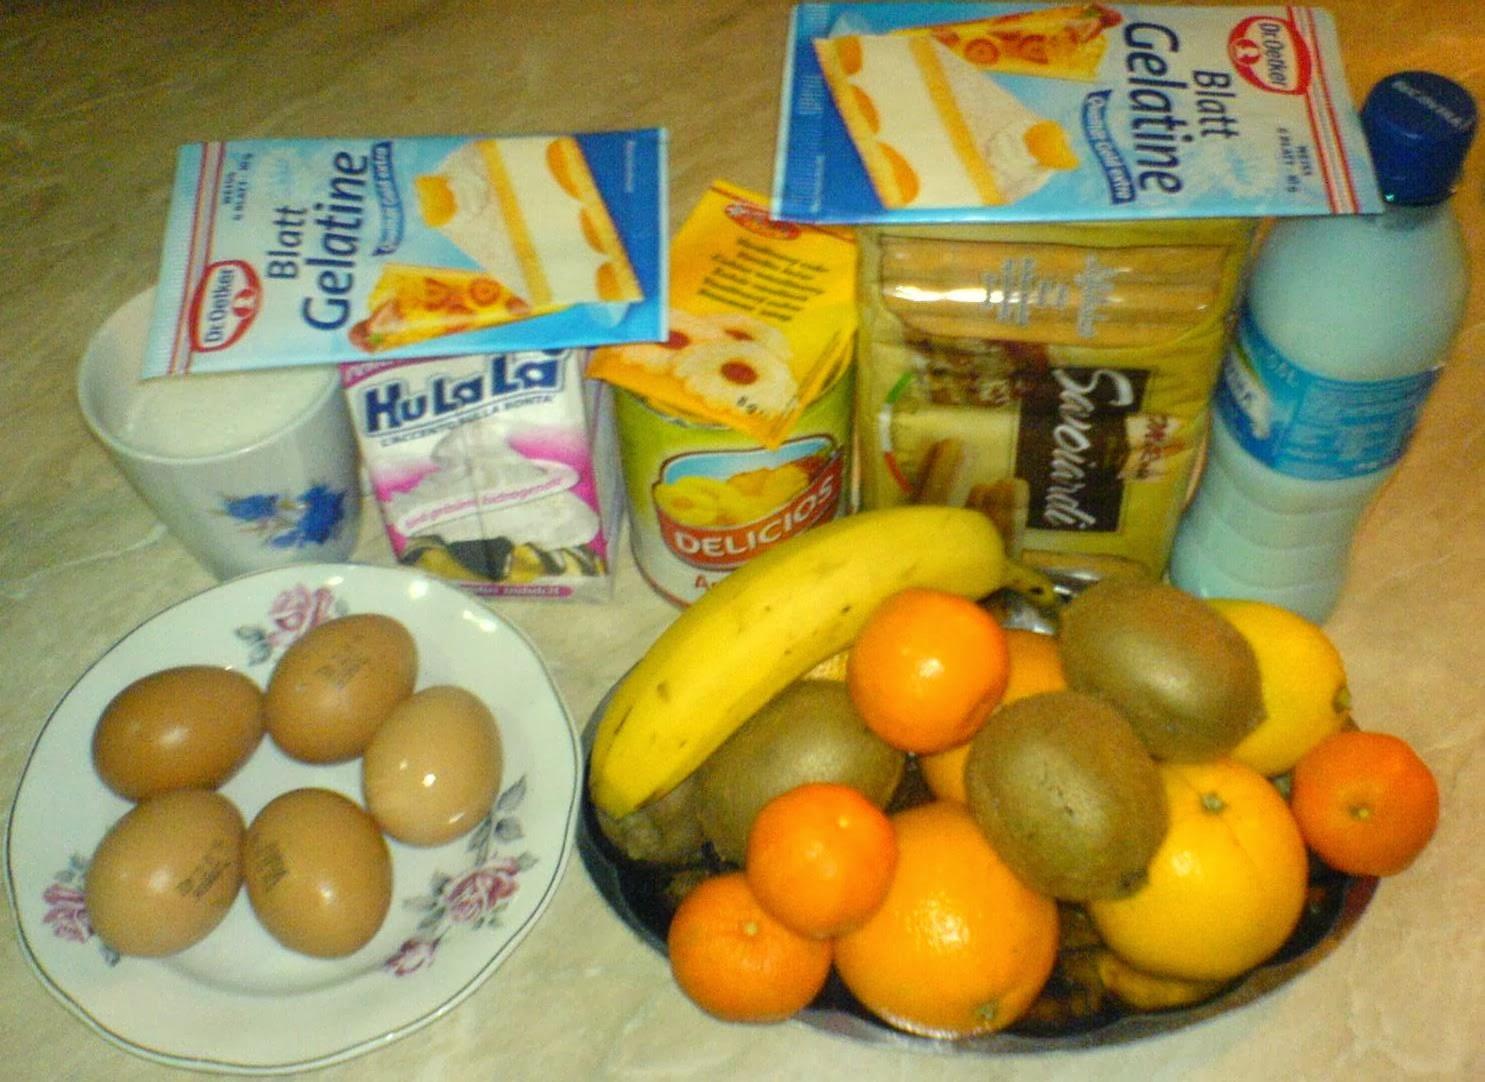 ingrediente pentru tort diplomat, ingrediente pentru tort diplomat cu fructe, retete si preparate culinare de dulciuri si prajituri de casa cu fructe,